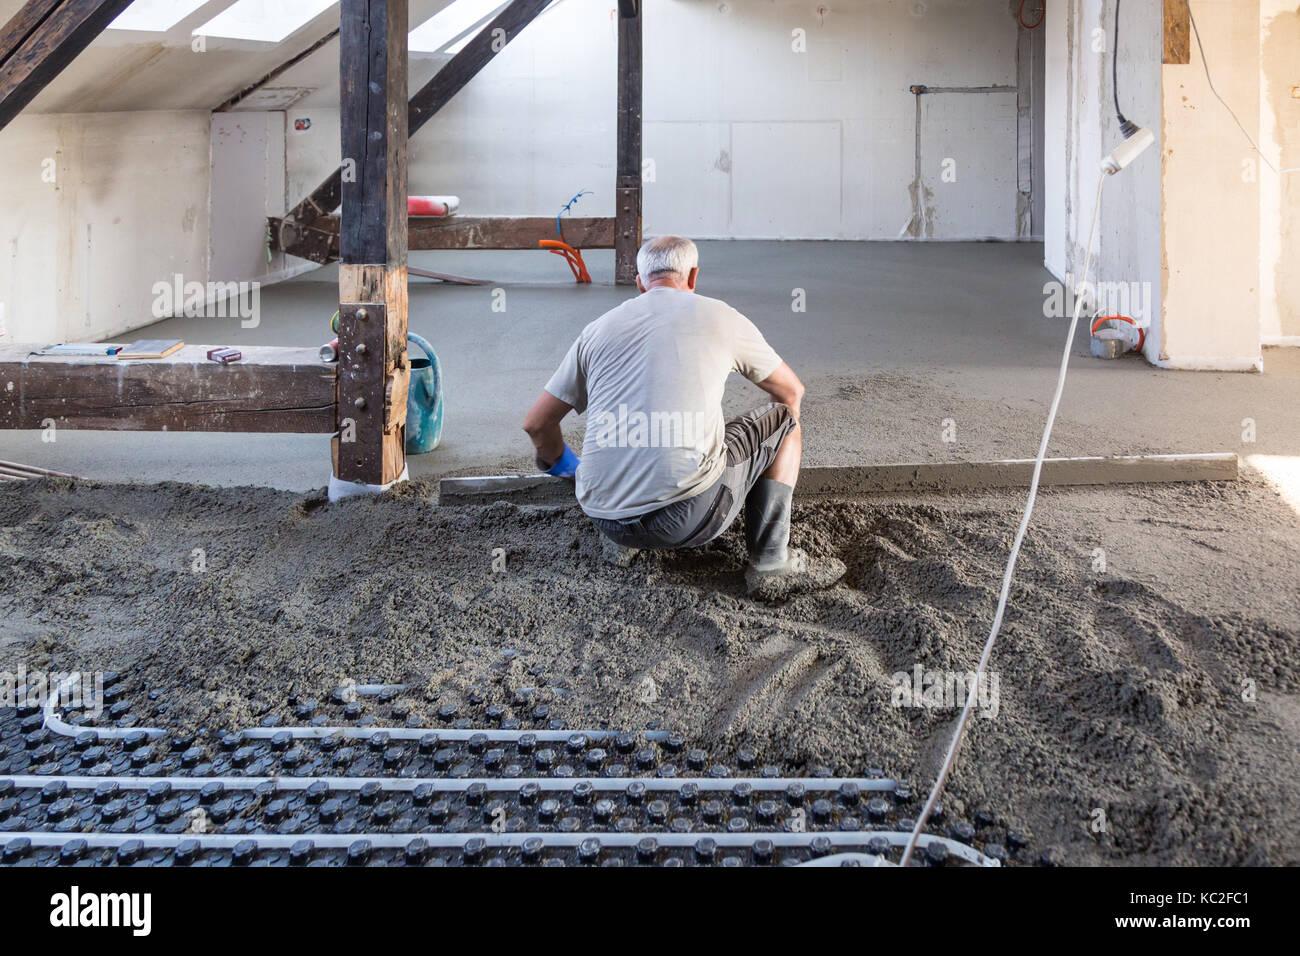 Fußboden Teppich Terbaik ~ Estrichaufbau bei fußbodenheizung estrichaufbau fußbodenheizung